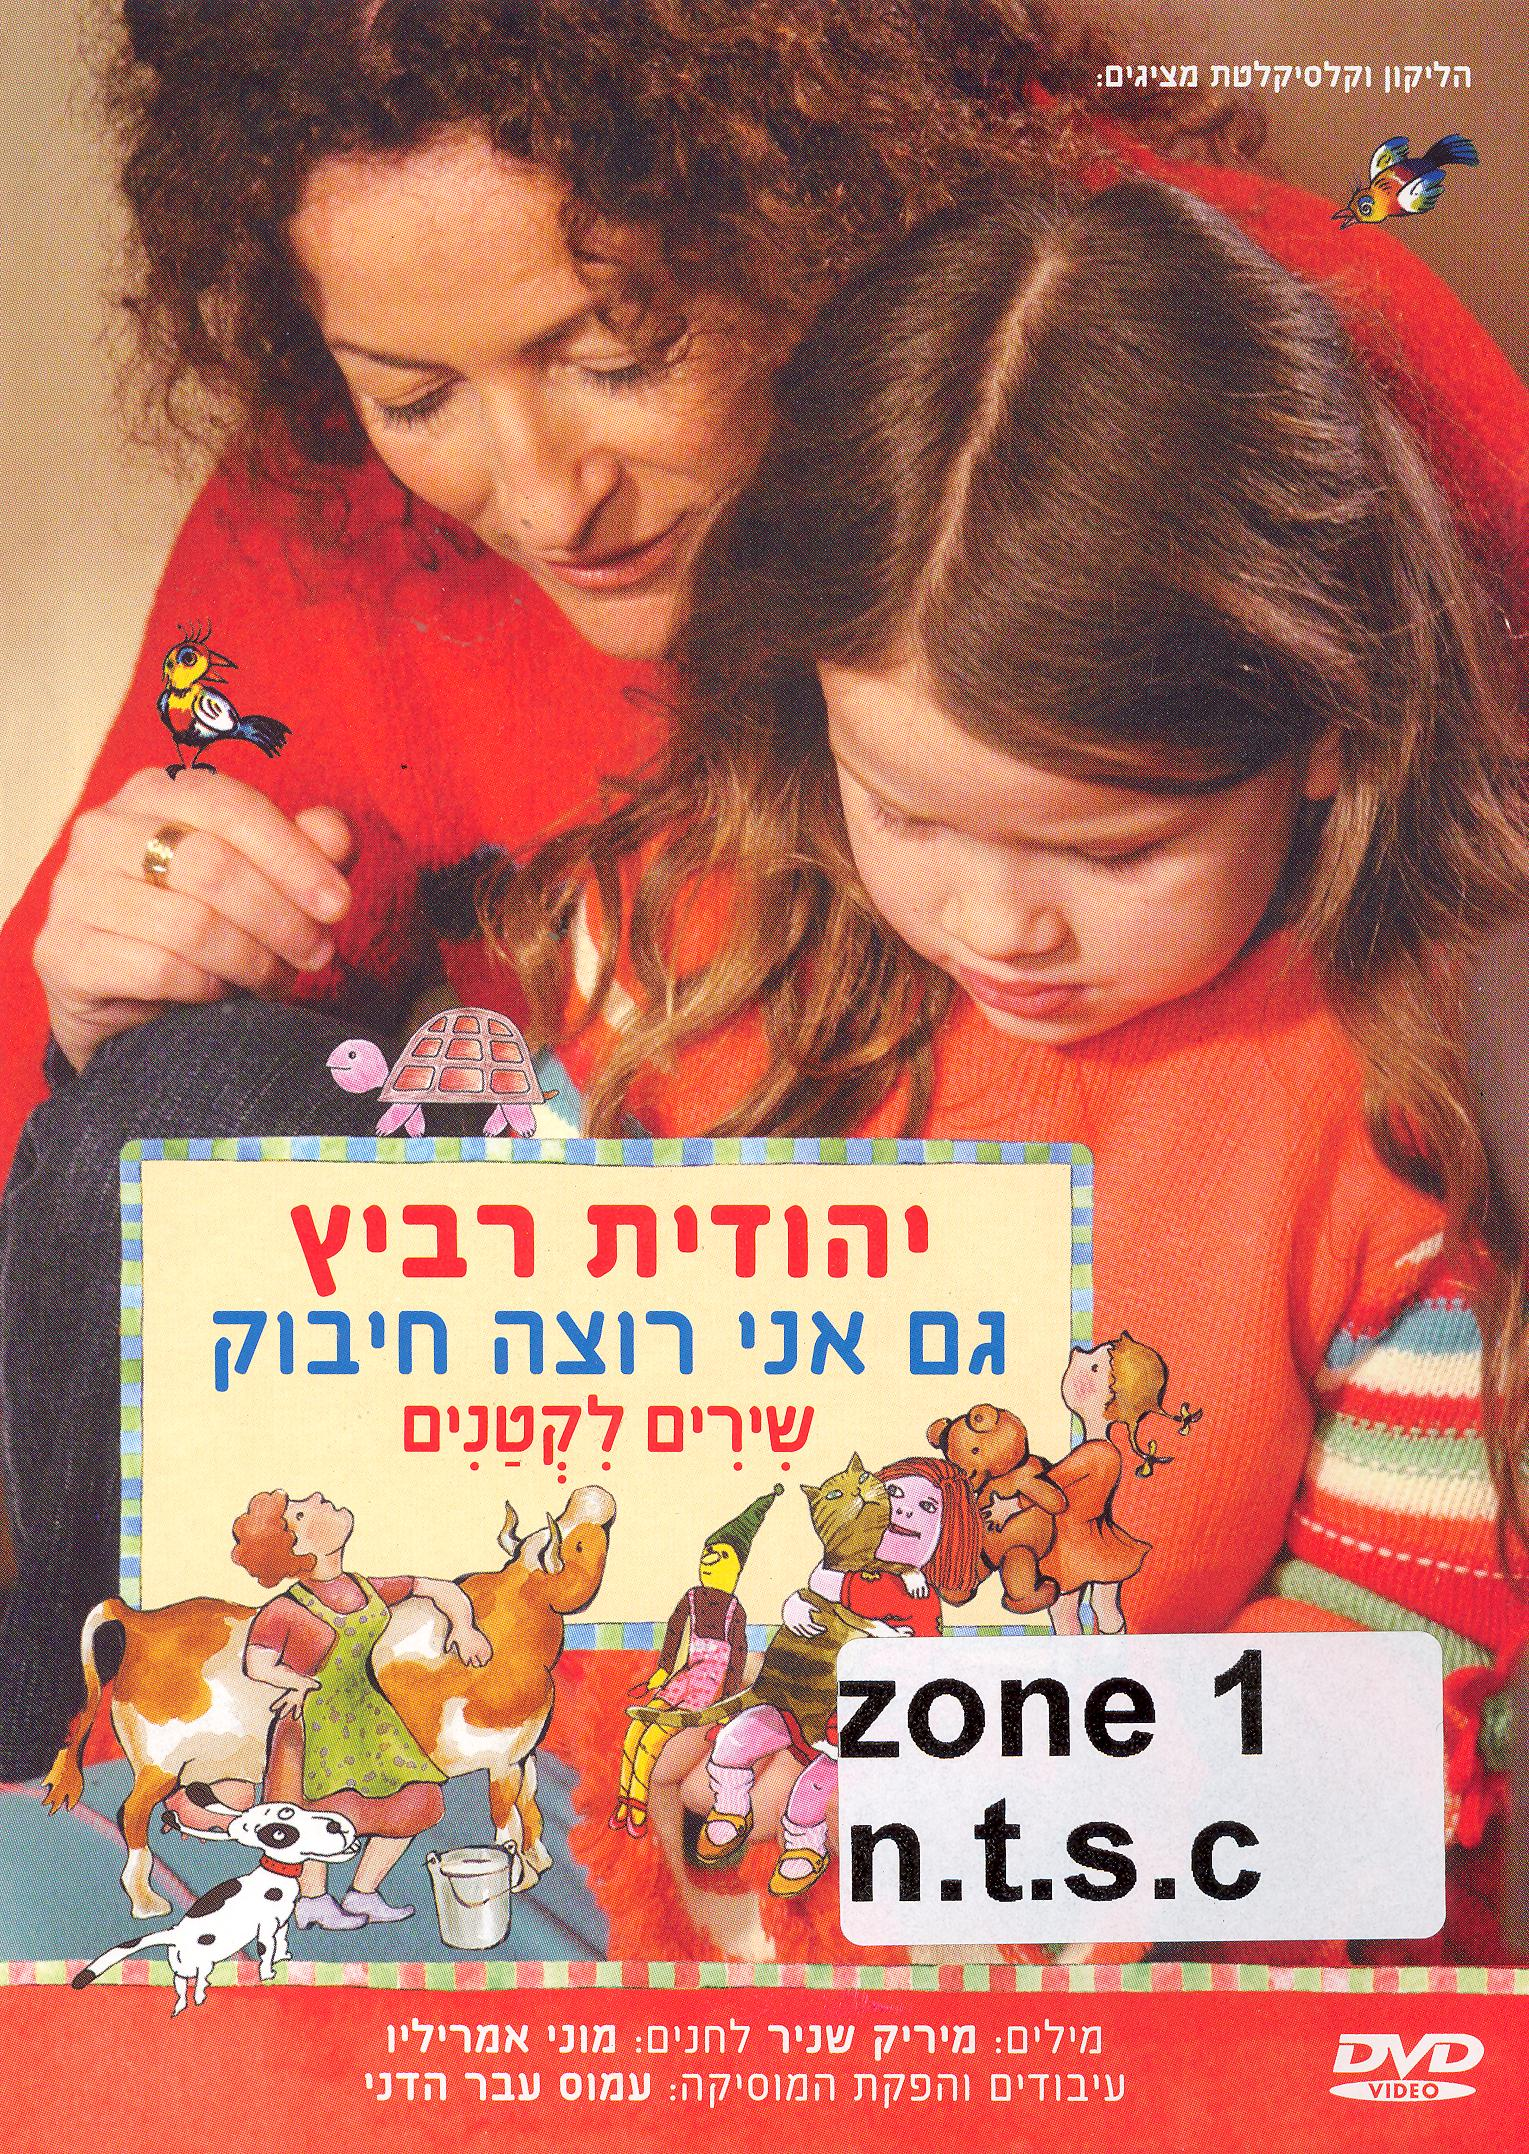 I Want a Hug Too with Yehudit Ravitz